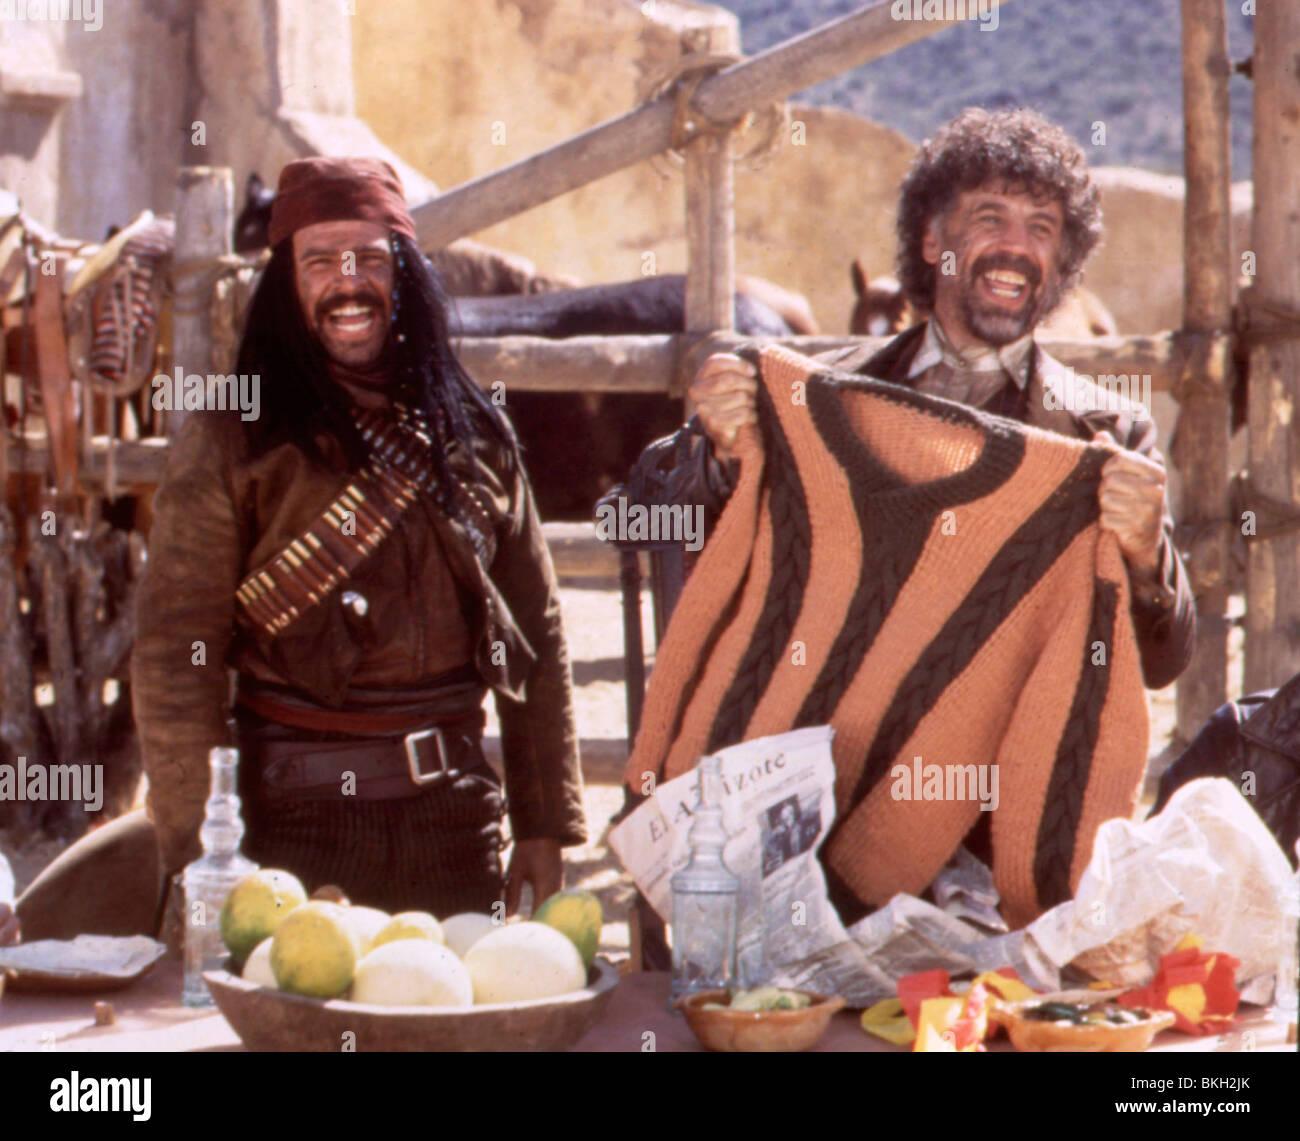 THREE AMIGOS (1986) 3 AMIGOS (ALT) ALFONSO ARAU TTAM 021 - Stock Image